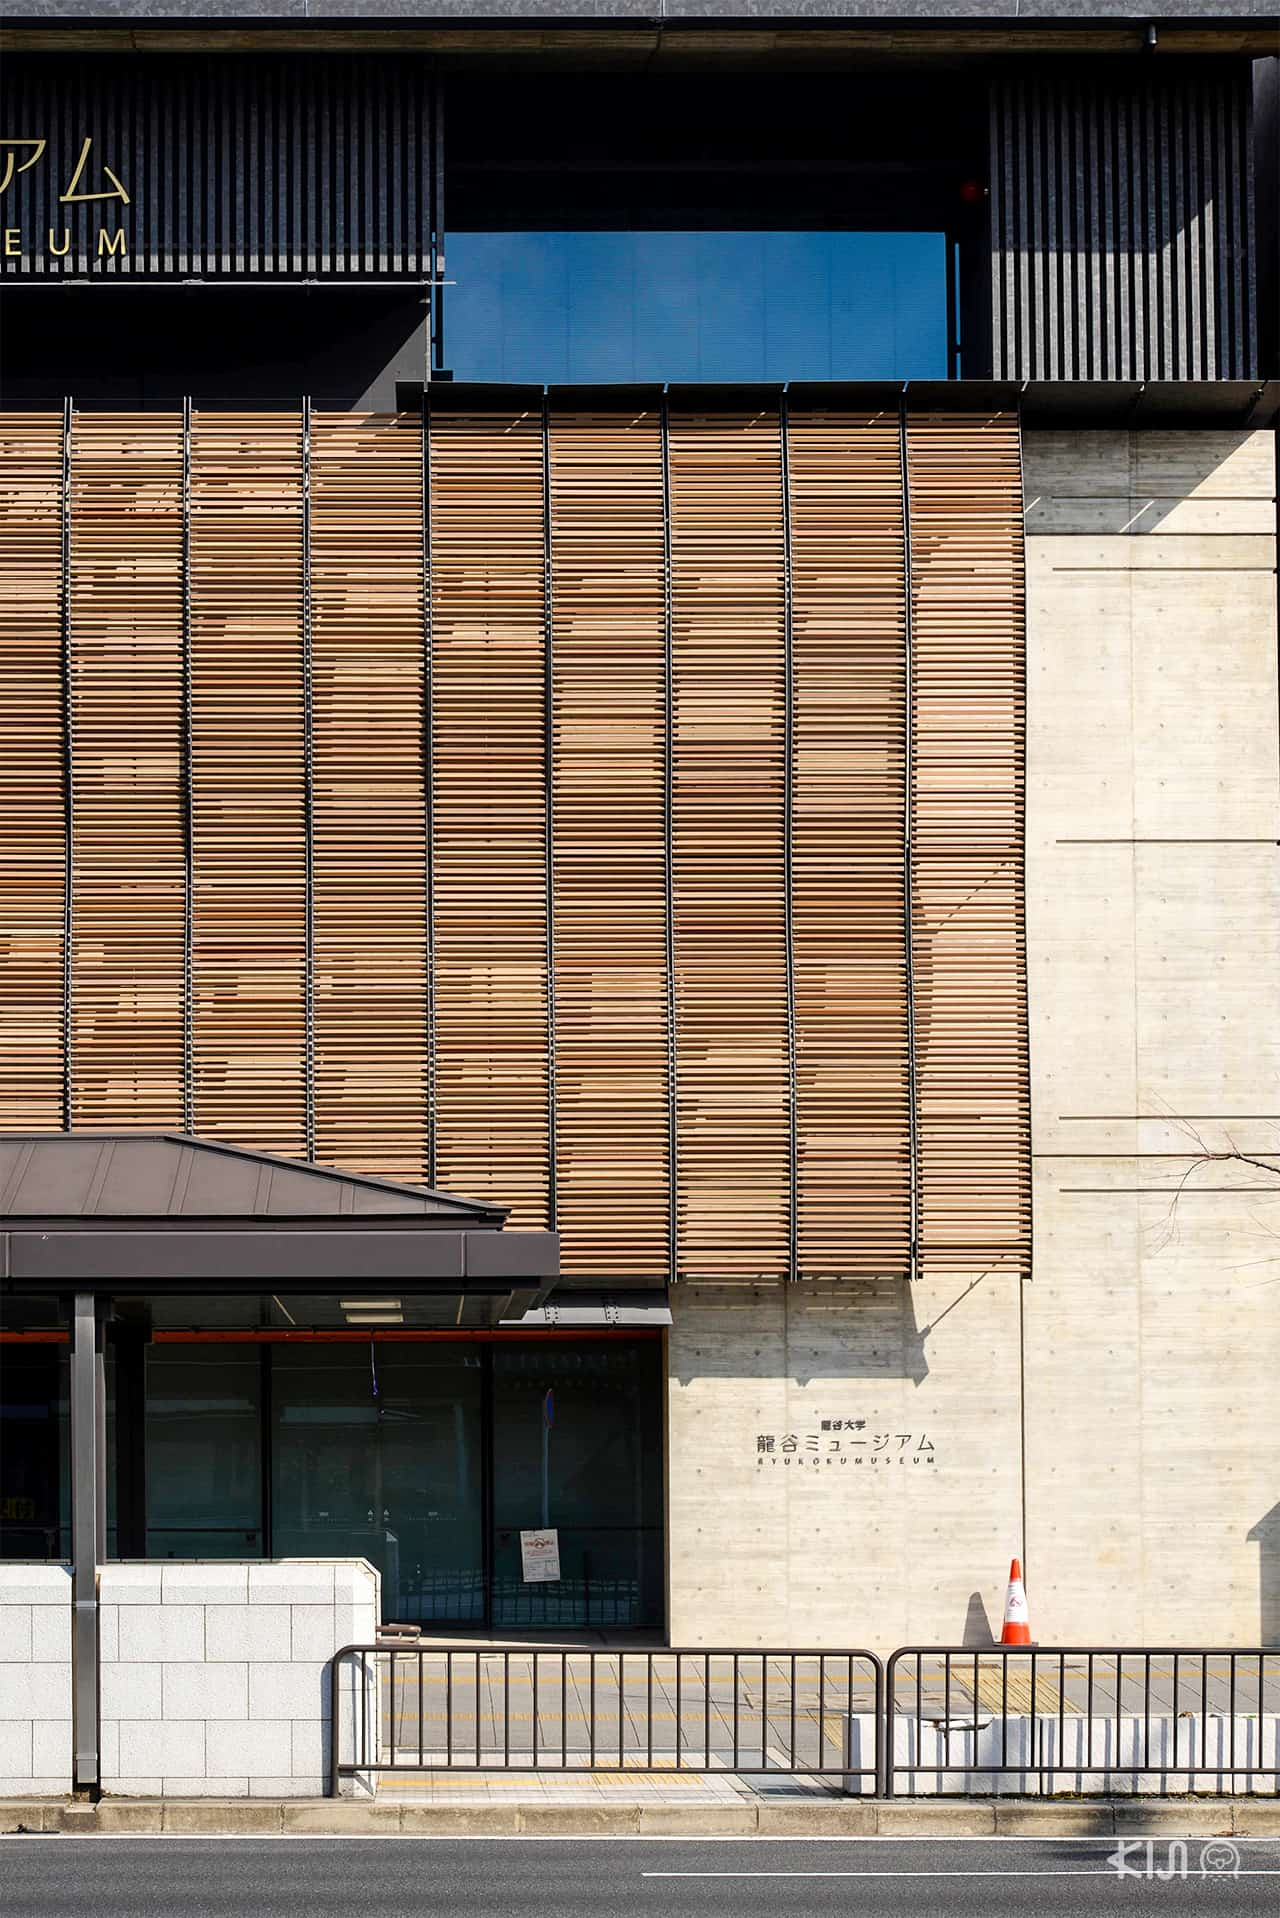 Ryukoku Museum พิพิธภัณฑ์คอนกรีตเปลือยที่ห่มด้วยม่านไม้